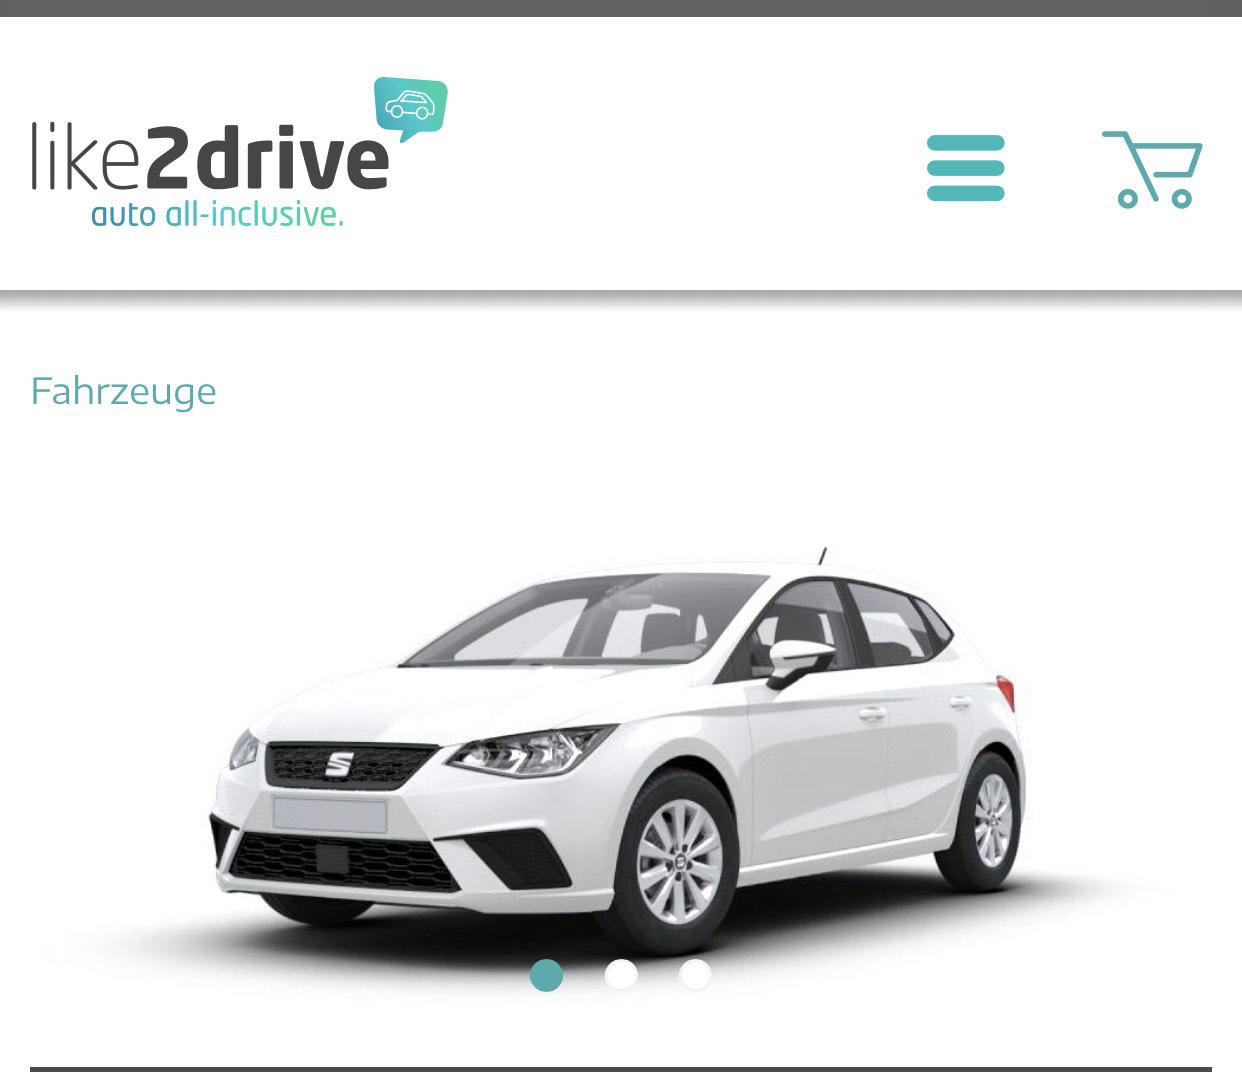 AutoAbo / Leasing Alternative inkl. Versicherung / Seat Ibiza CNG / 6M 199€ p.M. /10.000 km